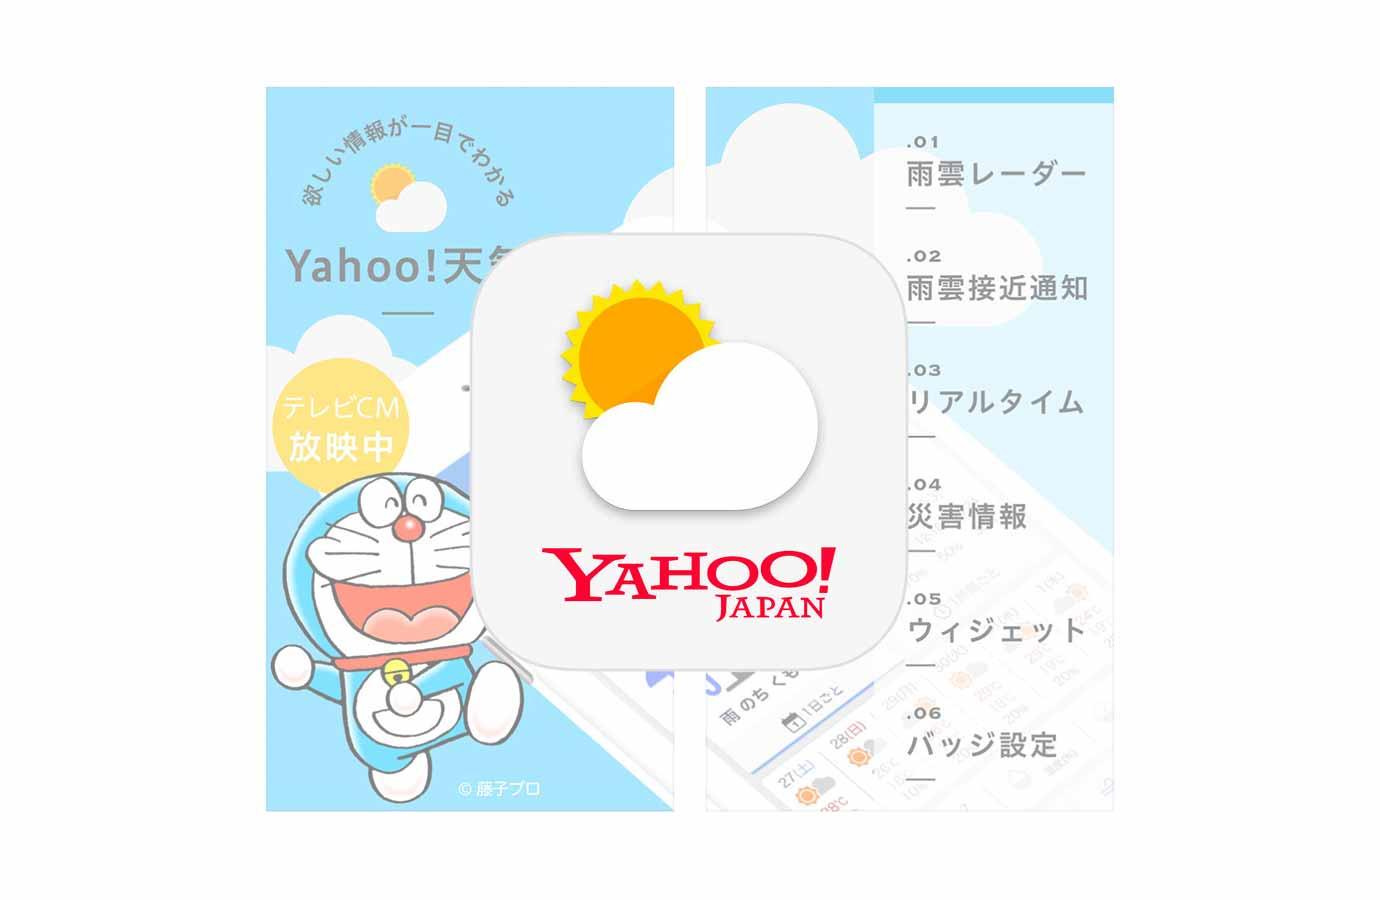 Yahoo Japan、「雨雲レーダー」がウィジェットに対応したiOSアプリ「Yahoo!天気 6.2.4」リリース